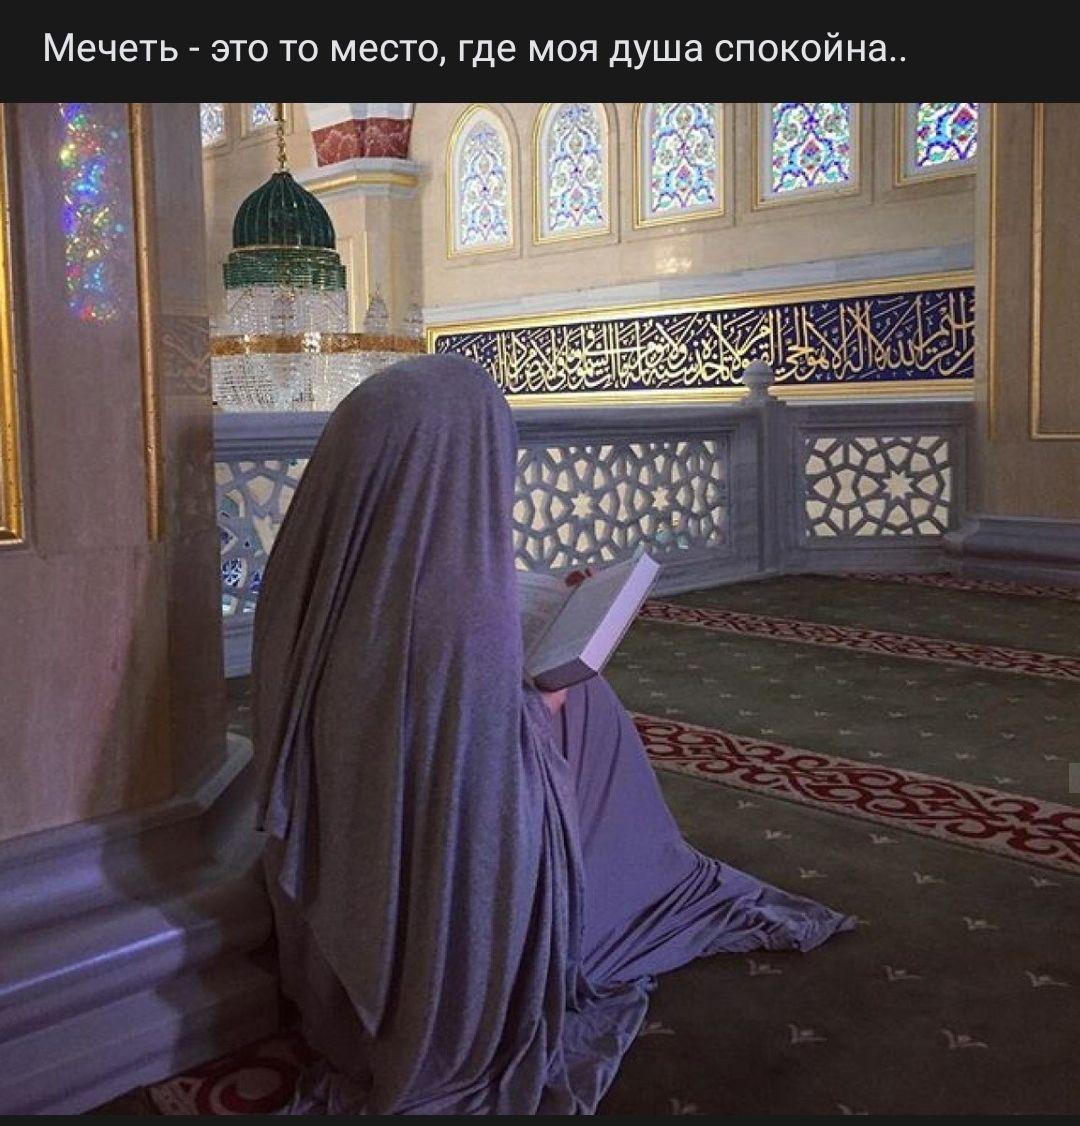 Pin By Nigar Isazade On Dini Statuslar Formal Dresses Long Hijab Fashion Fashion